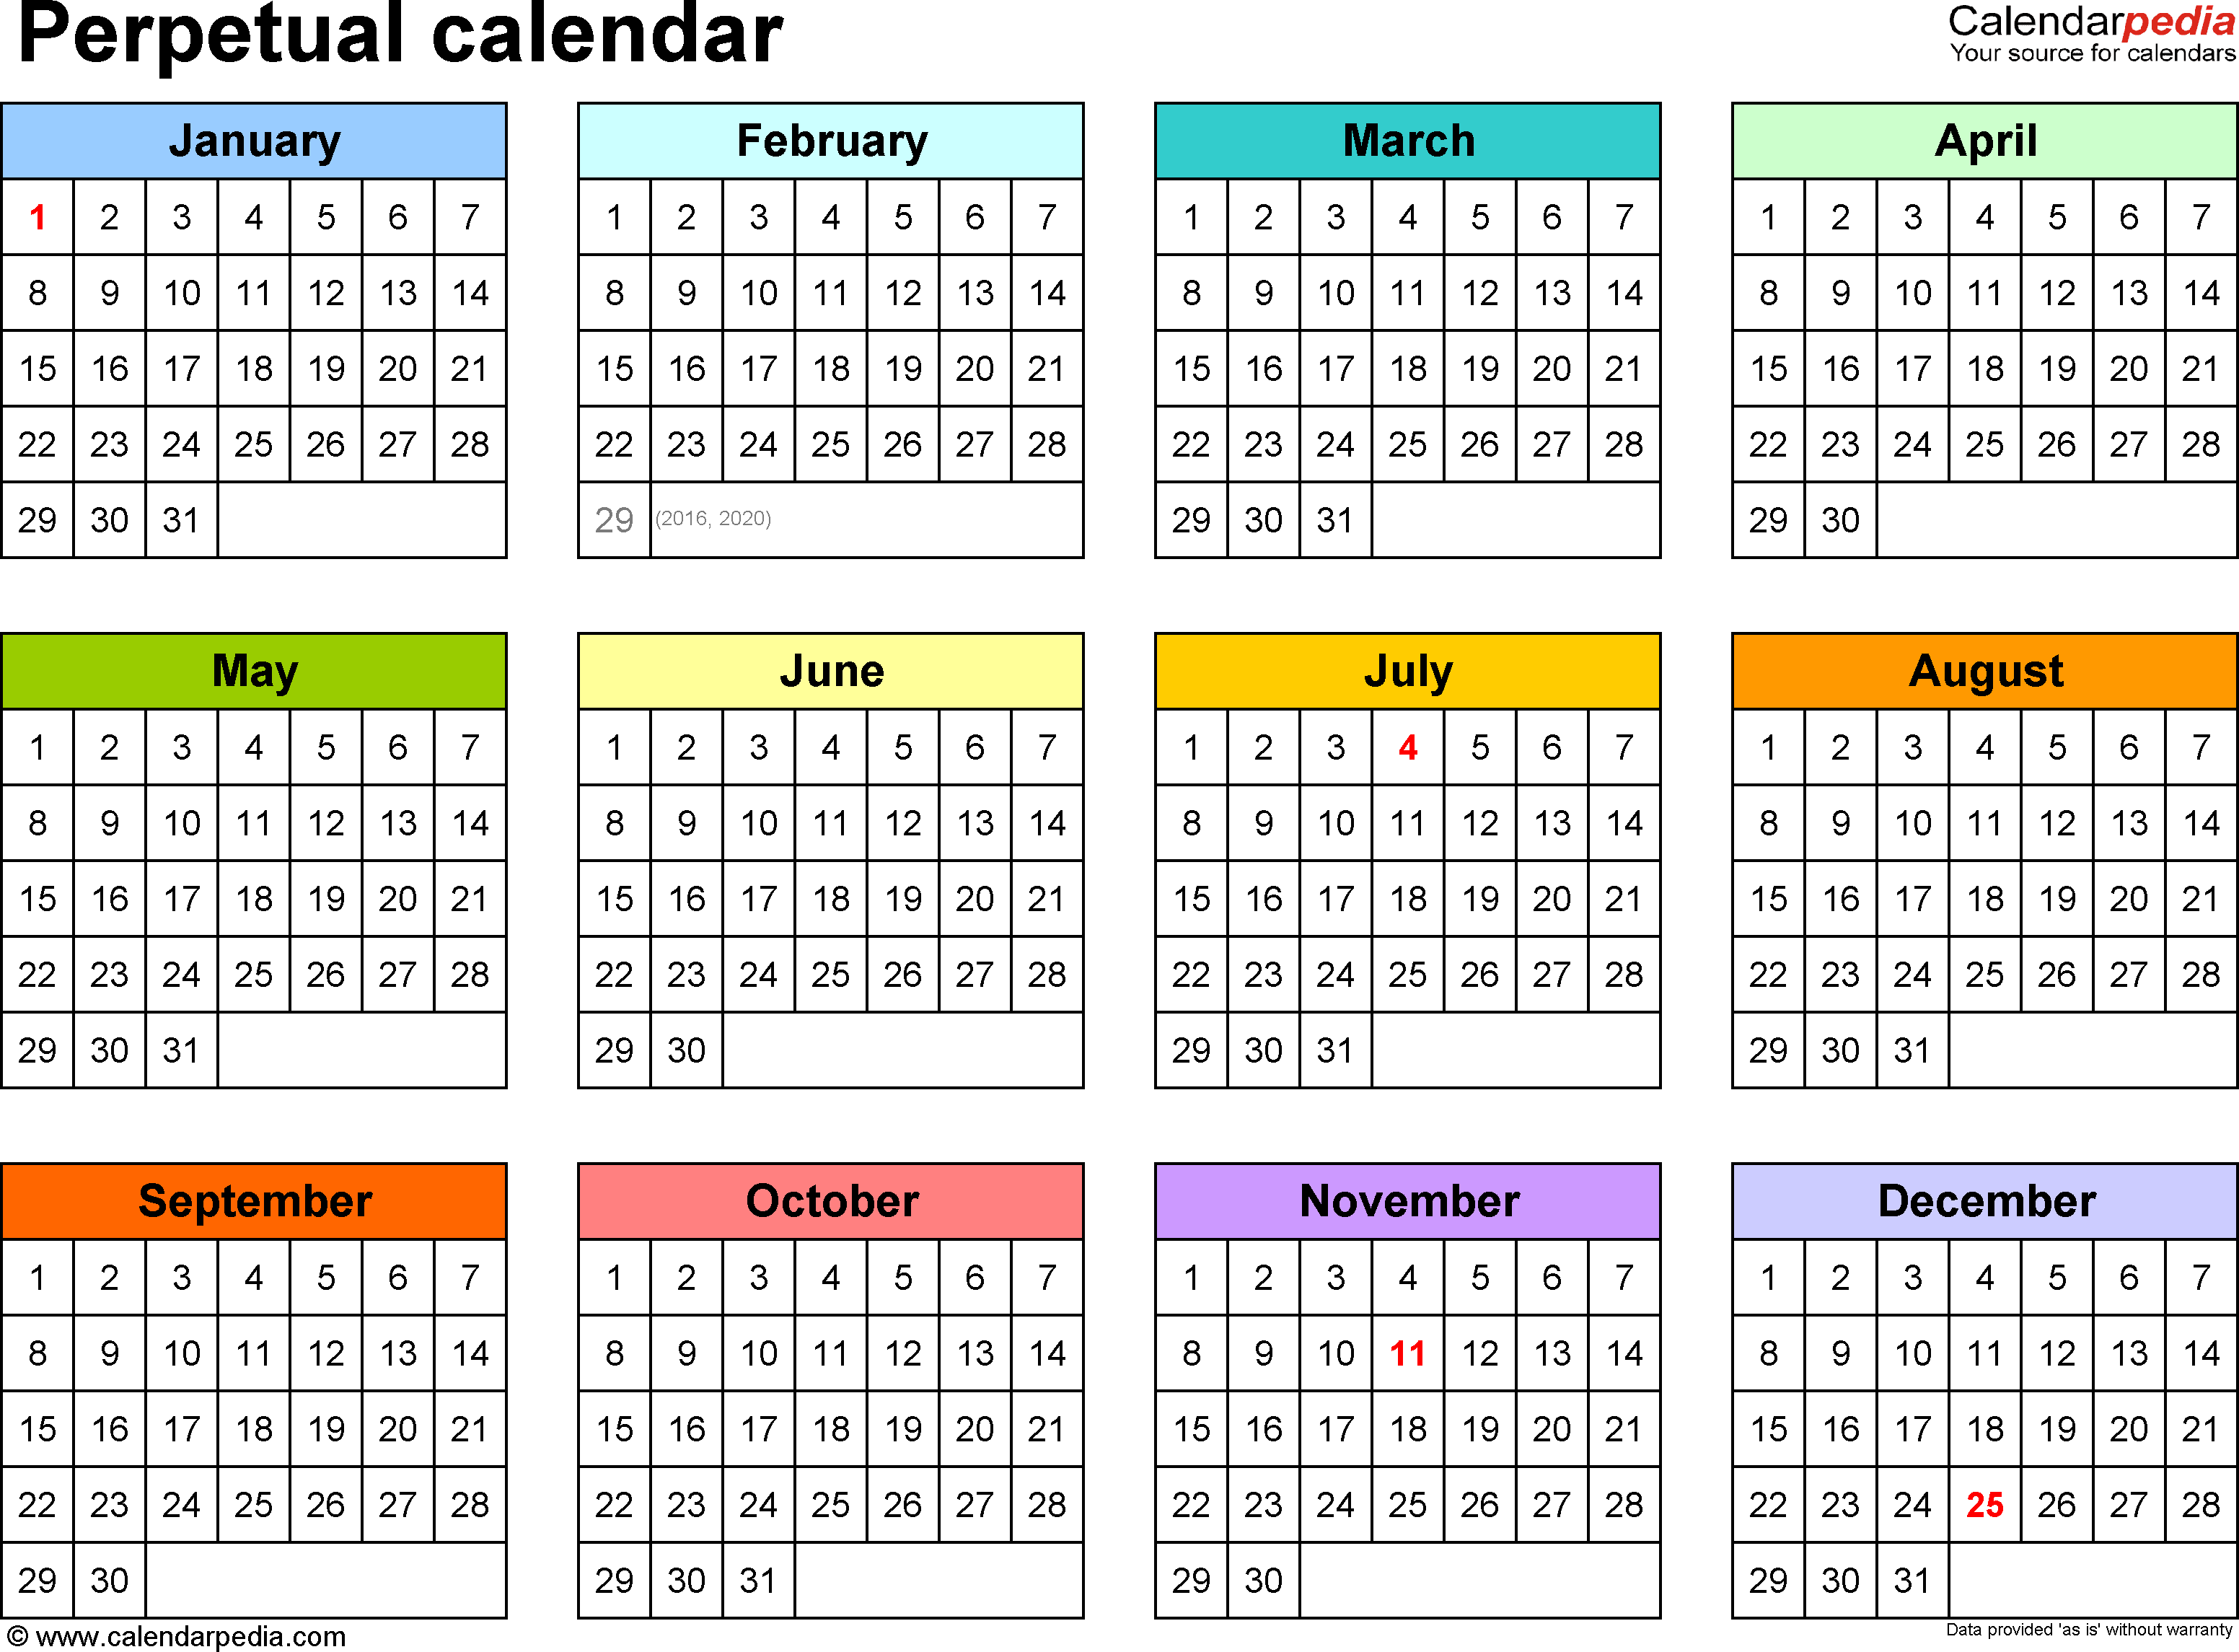 template 5 pdf template for perpetual calendar landscape orientation 1 page